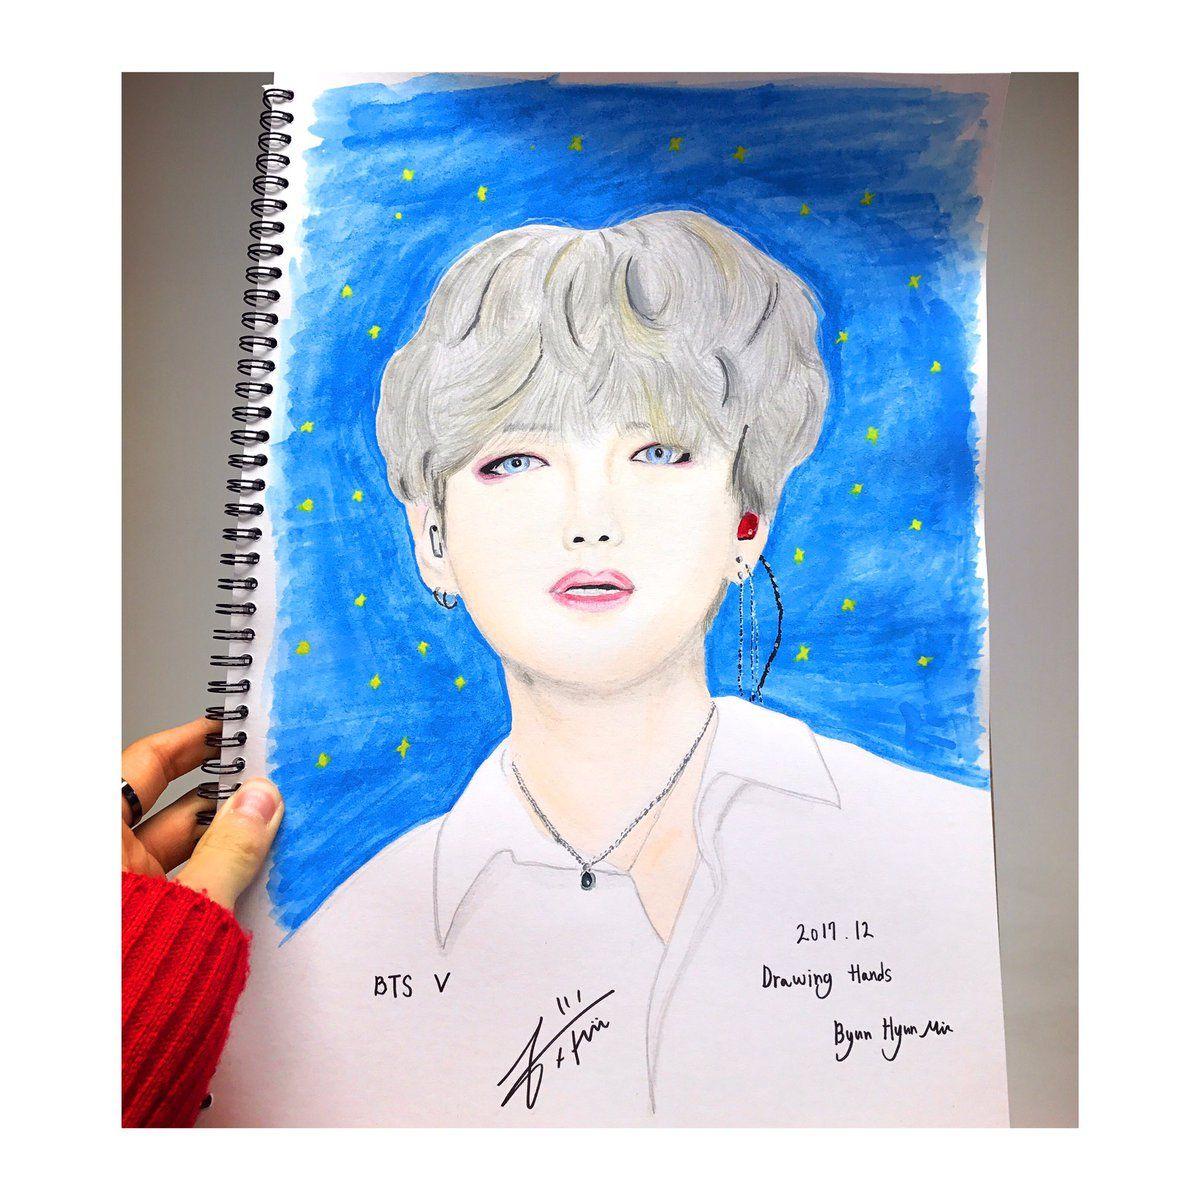 Rainz' Byun Hyun Min draws his role model, BTS' V | Drawings, Role models,  Bts v